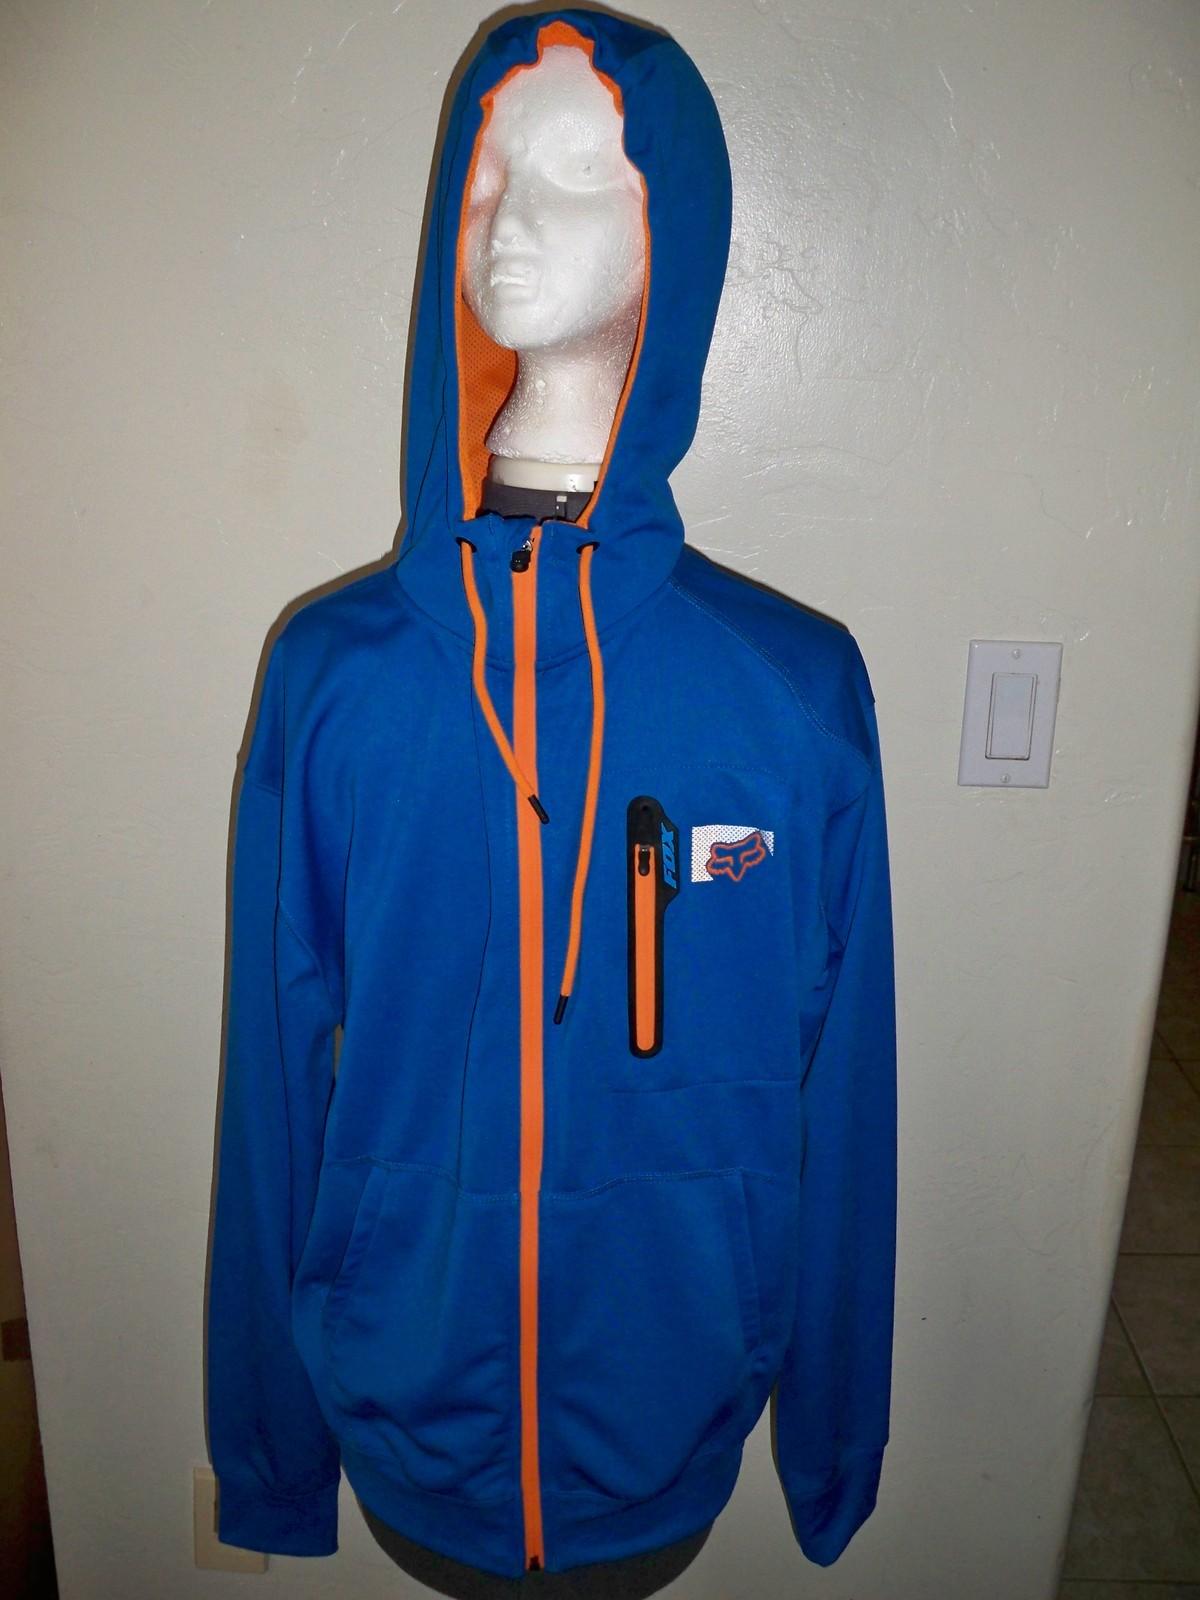 b3c881e79 Men's Guys Fox Racing Pullover Fleece Hoodie and 19 similar items. 100 2970